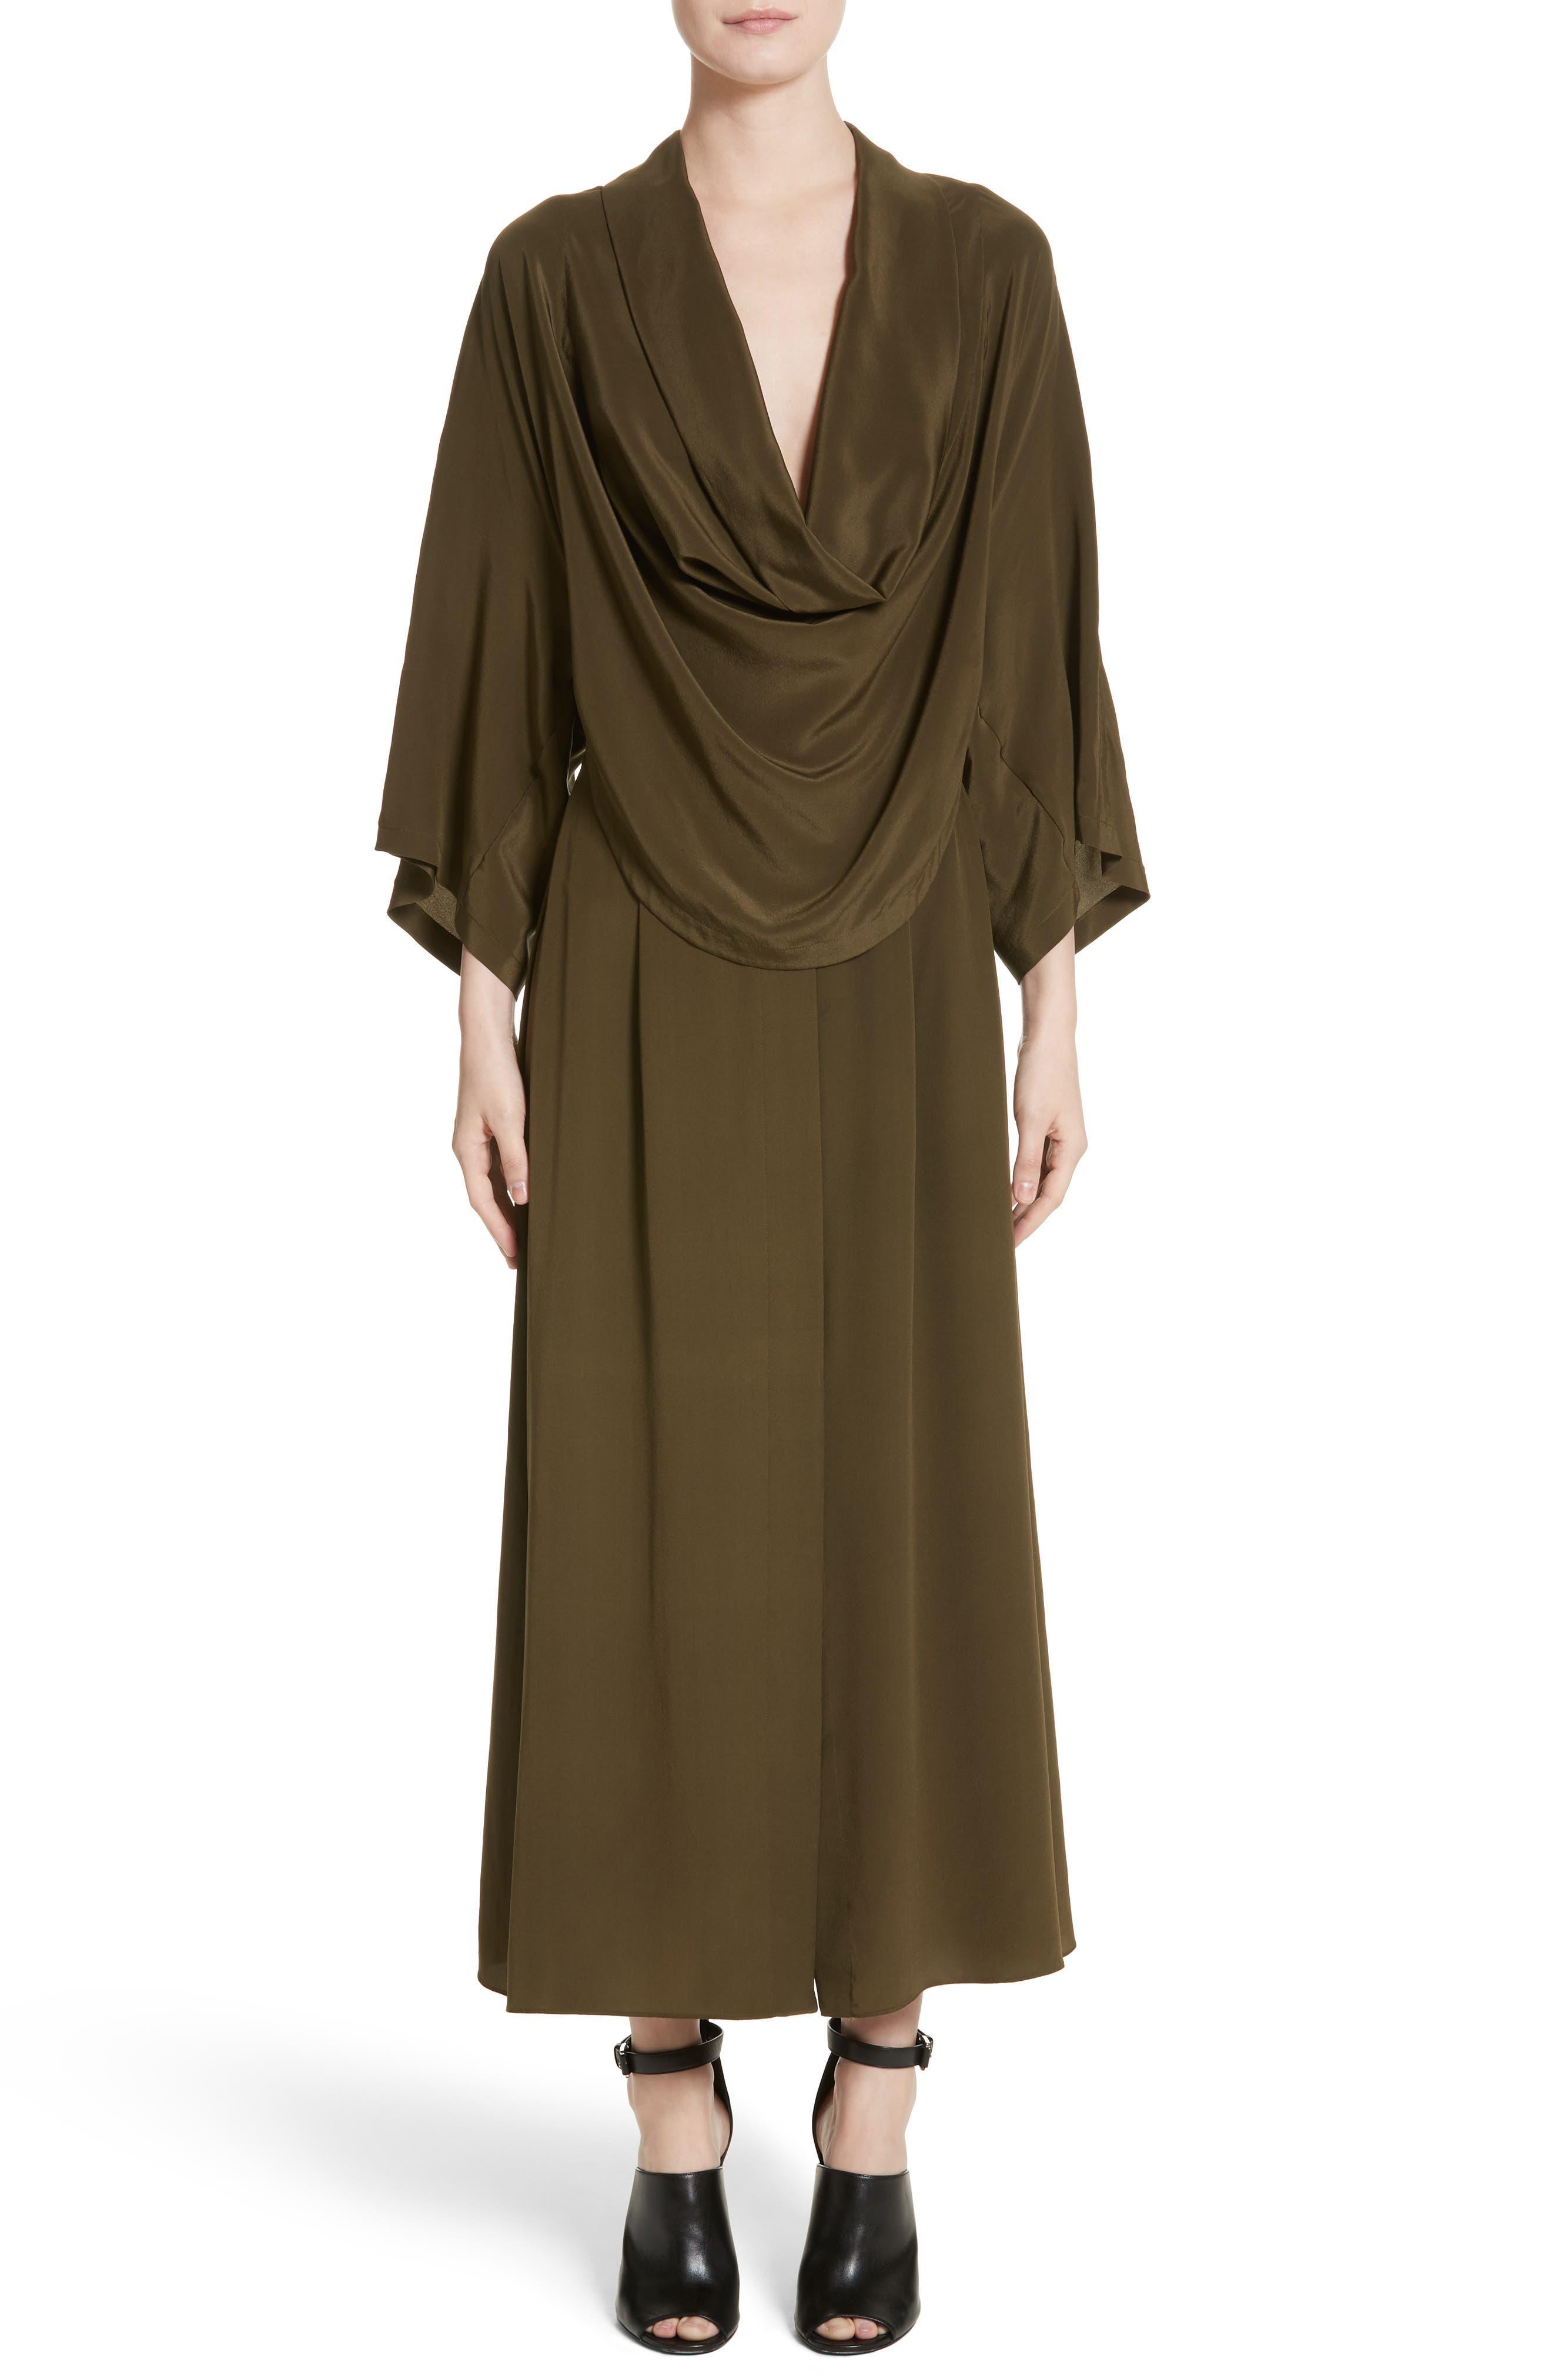 Michael Kors Silk Crêpe de Chine Cowl Neck Shirtdress